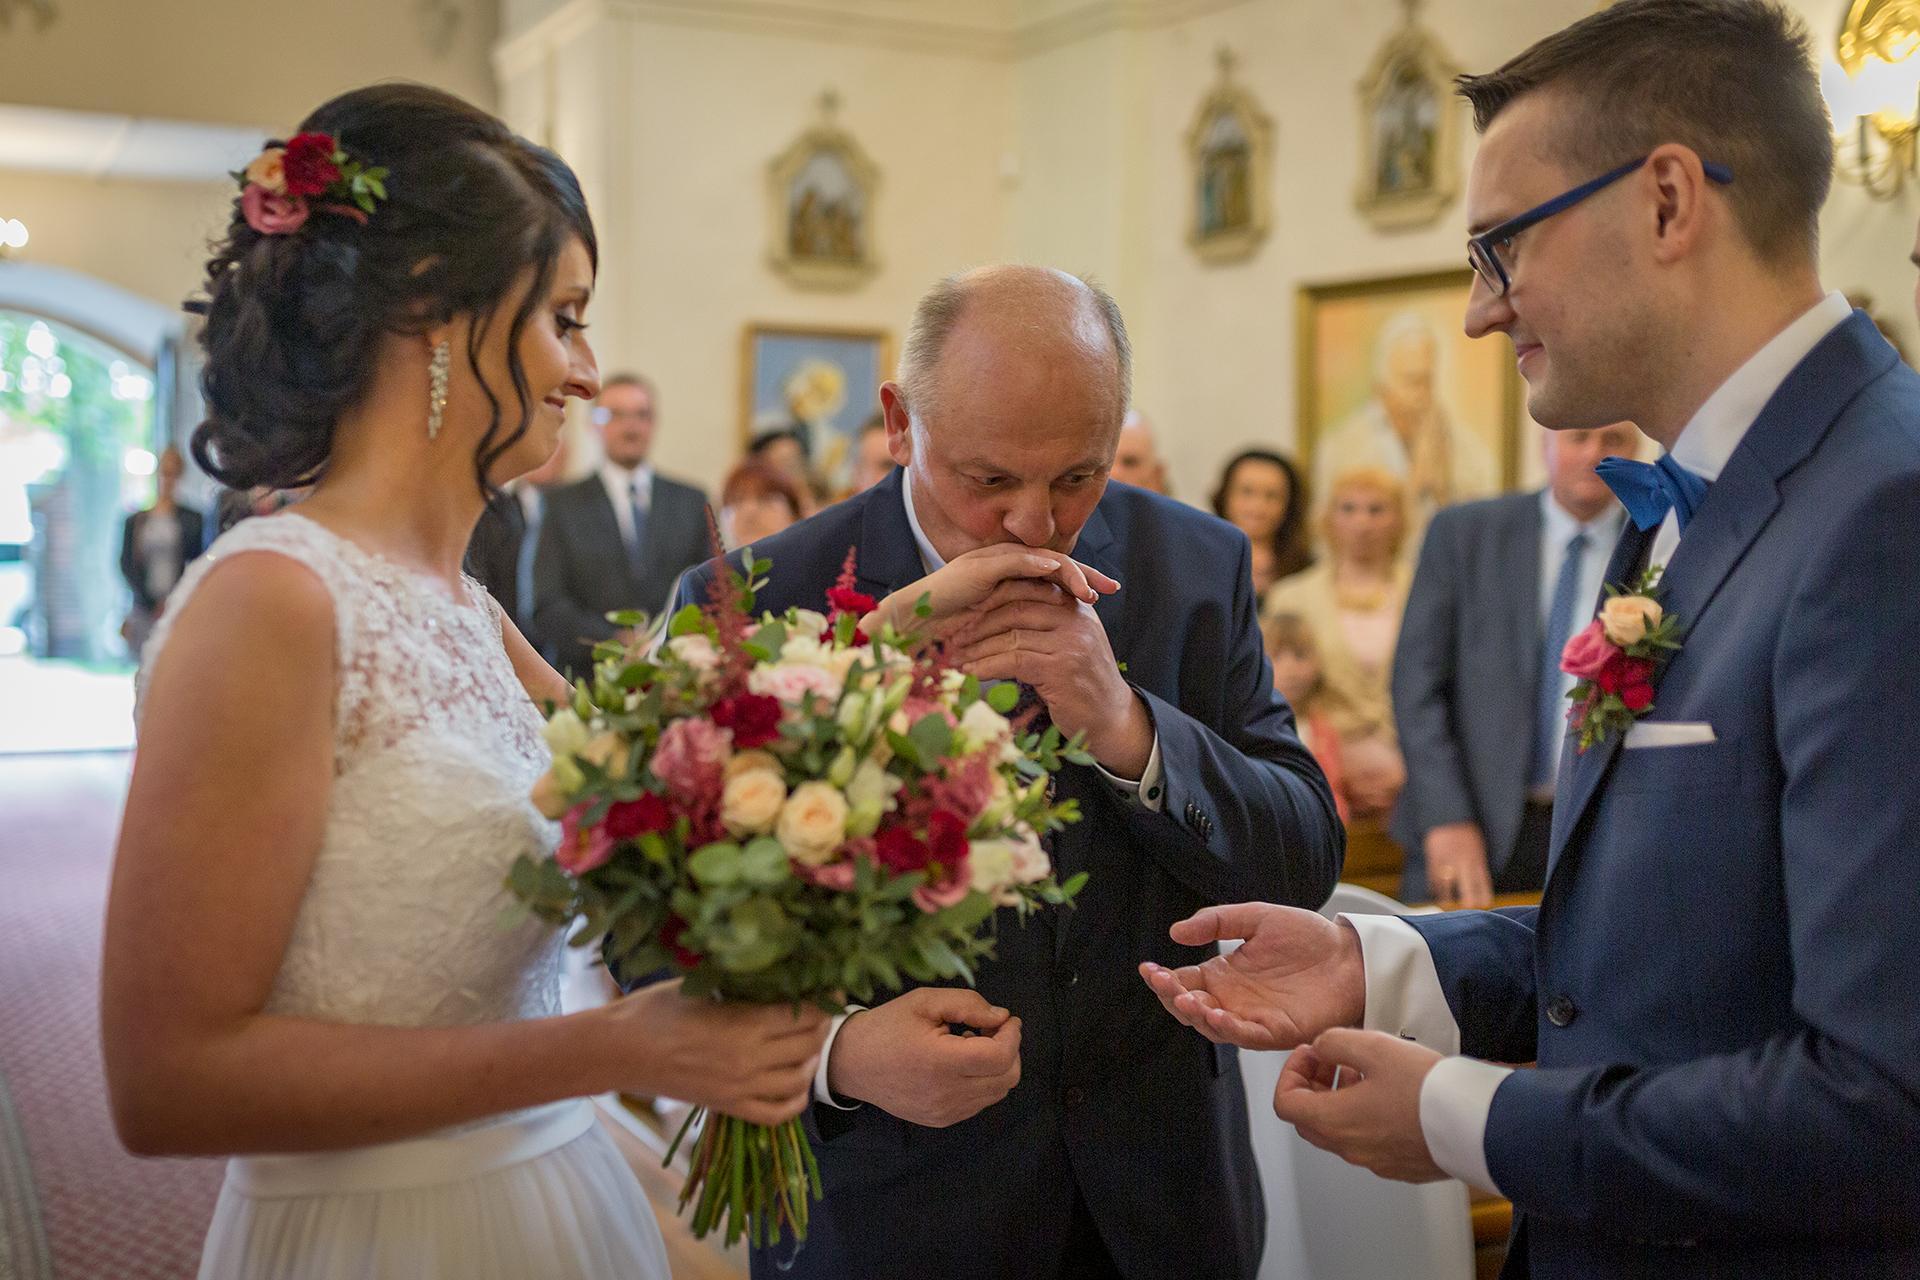 Ceremonia Ślubna - Tata Pani Młodej